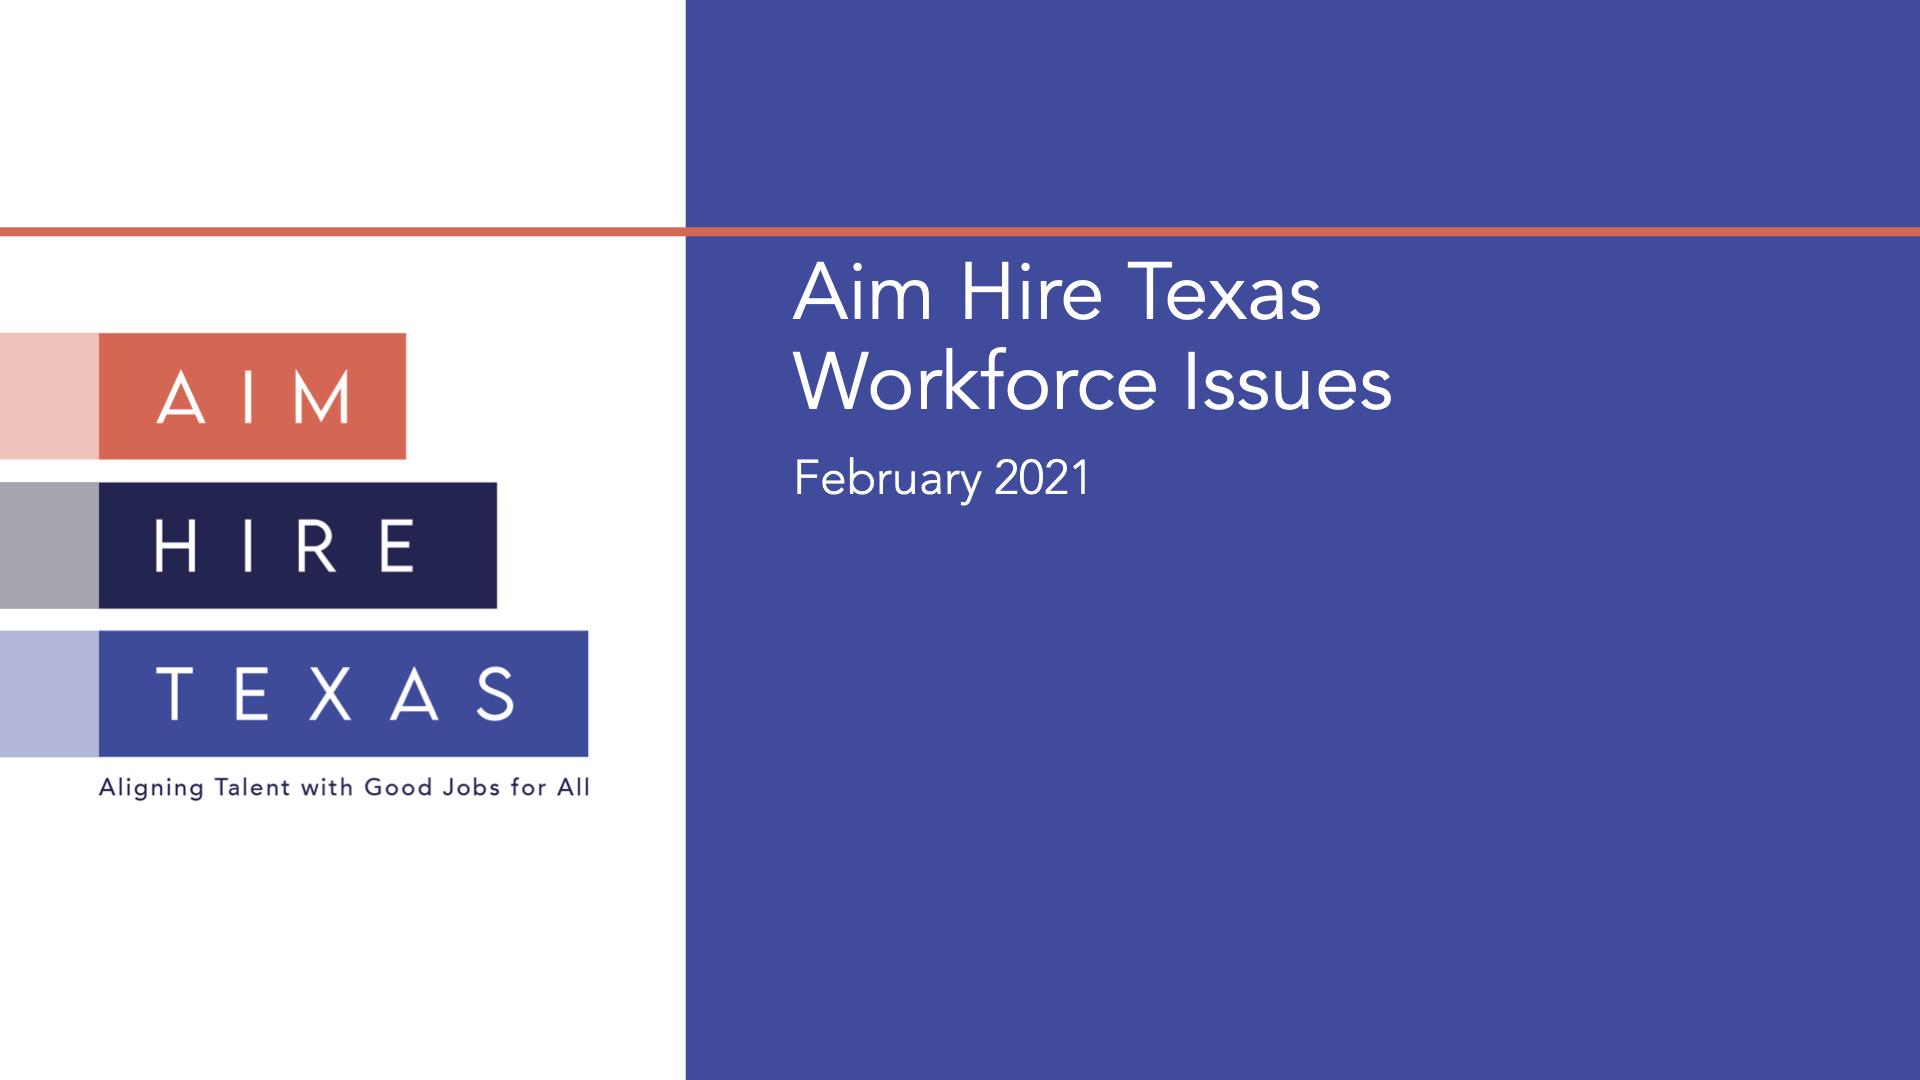 Aim Hire Texas Findings